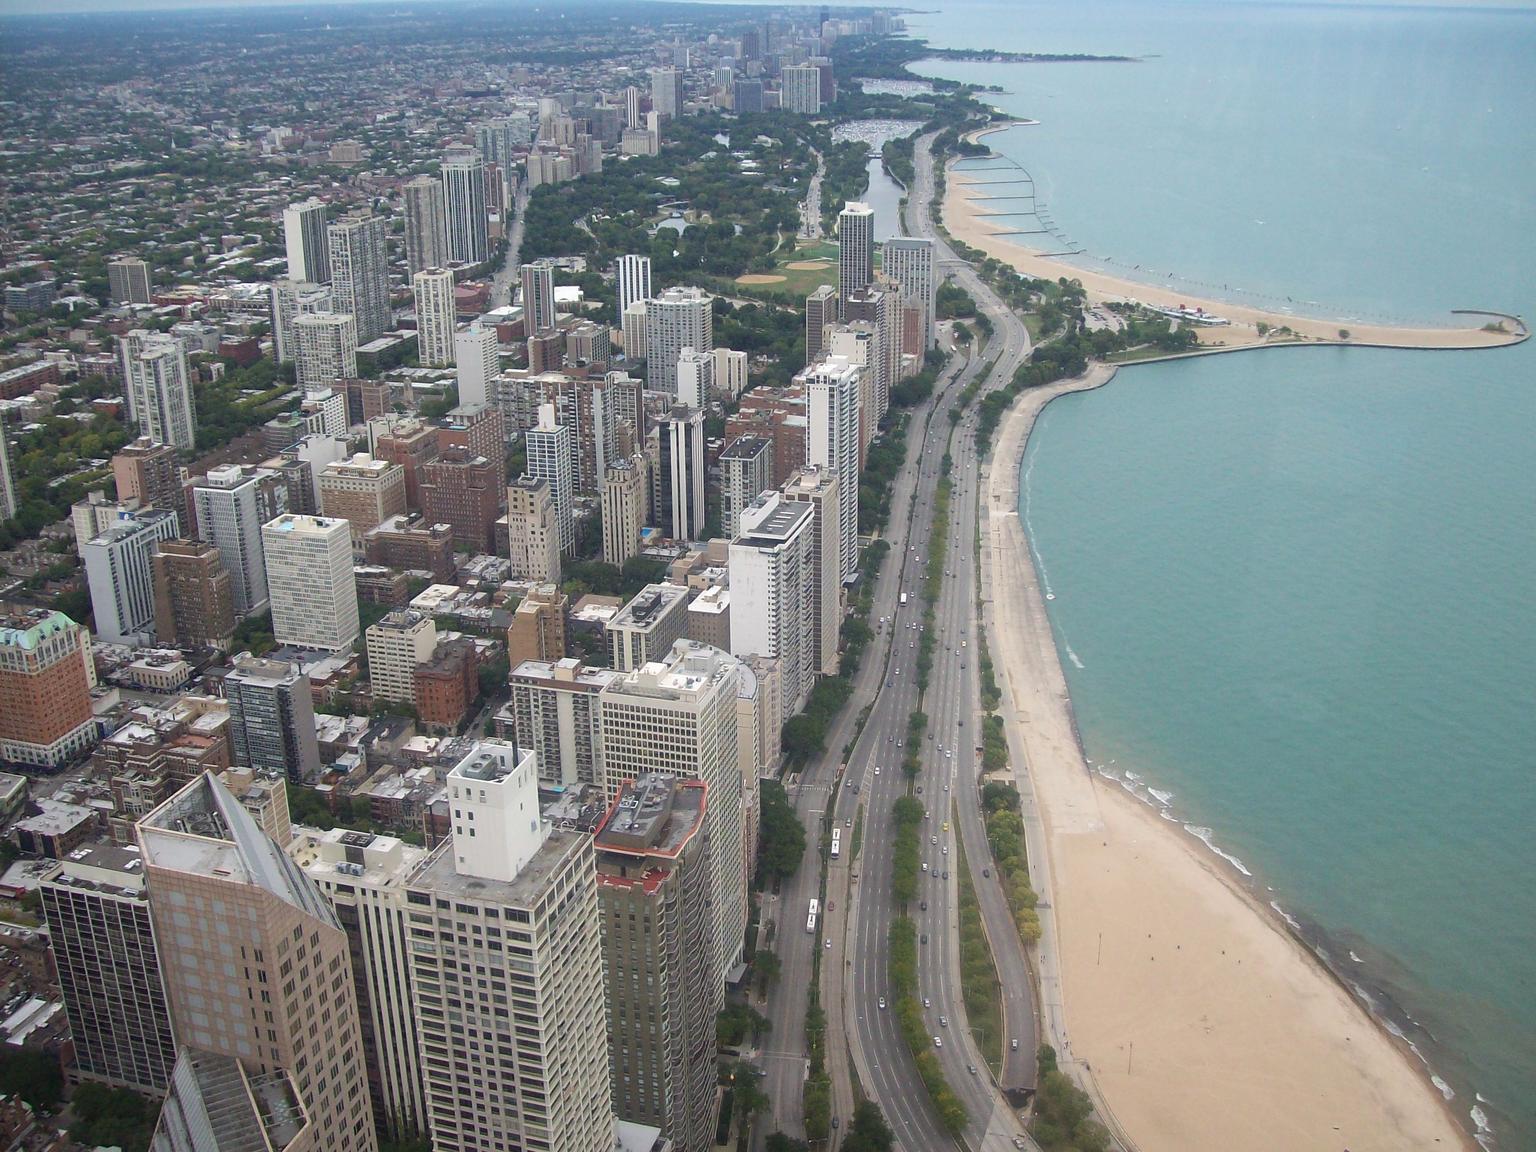 MÁS FOTOS, Chicago CityPASS